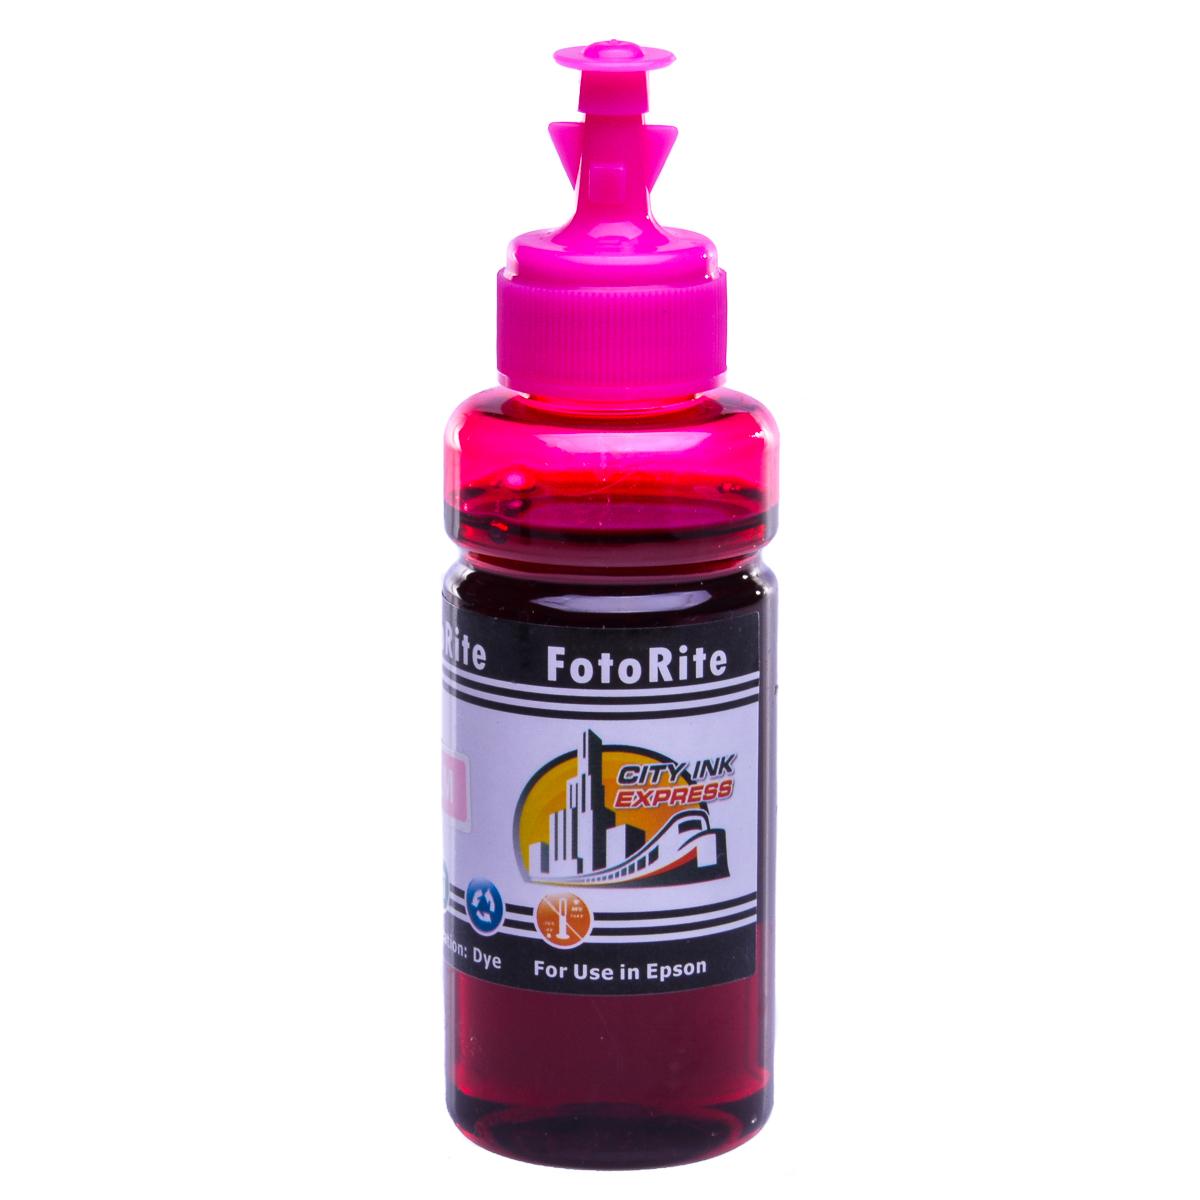 Cheap Light Magenta dye ink replaces Epson XP-850 - T2425